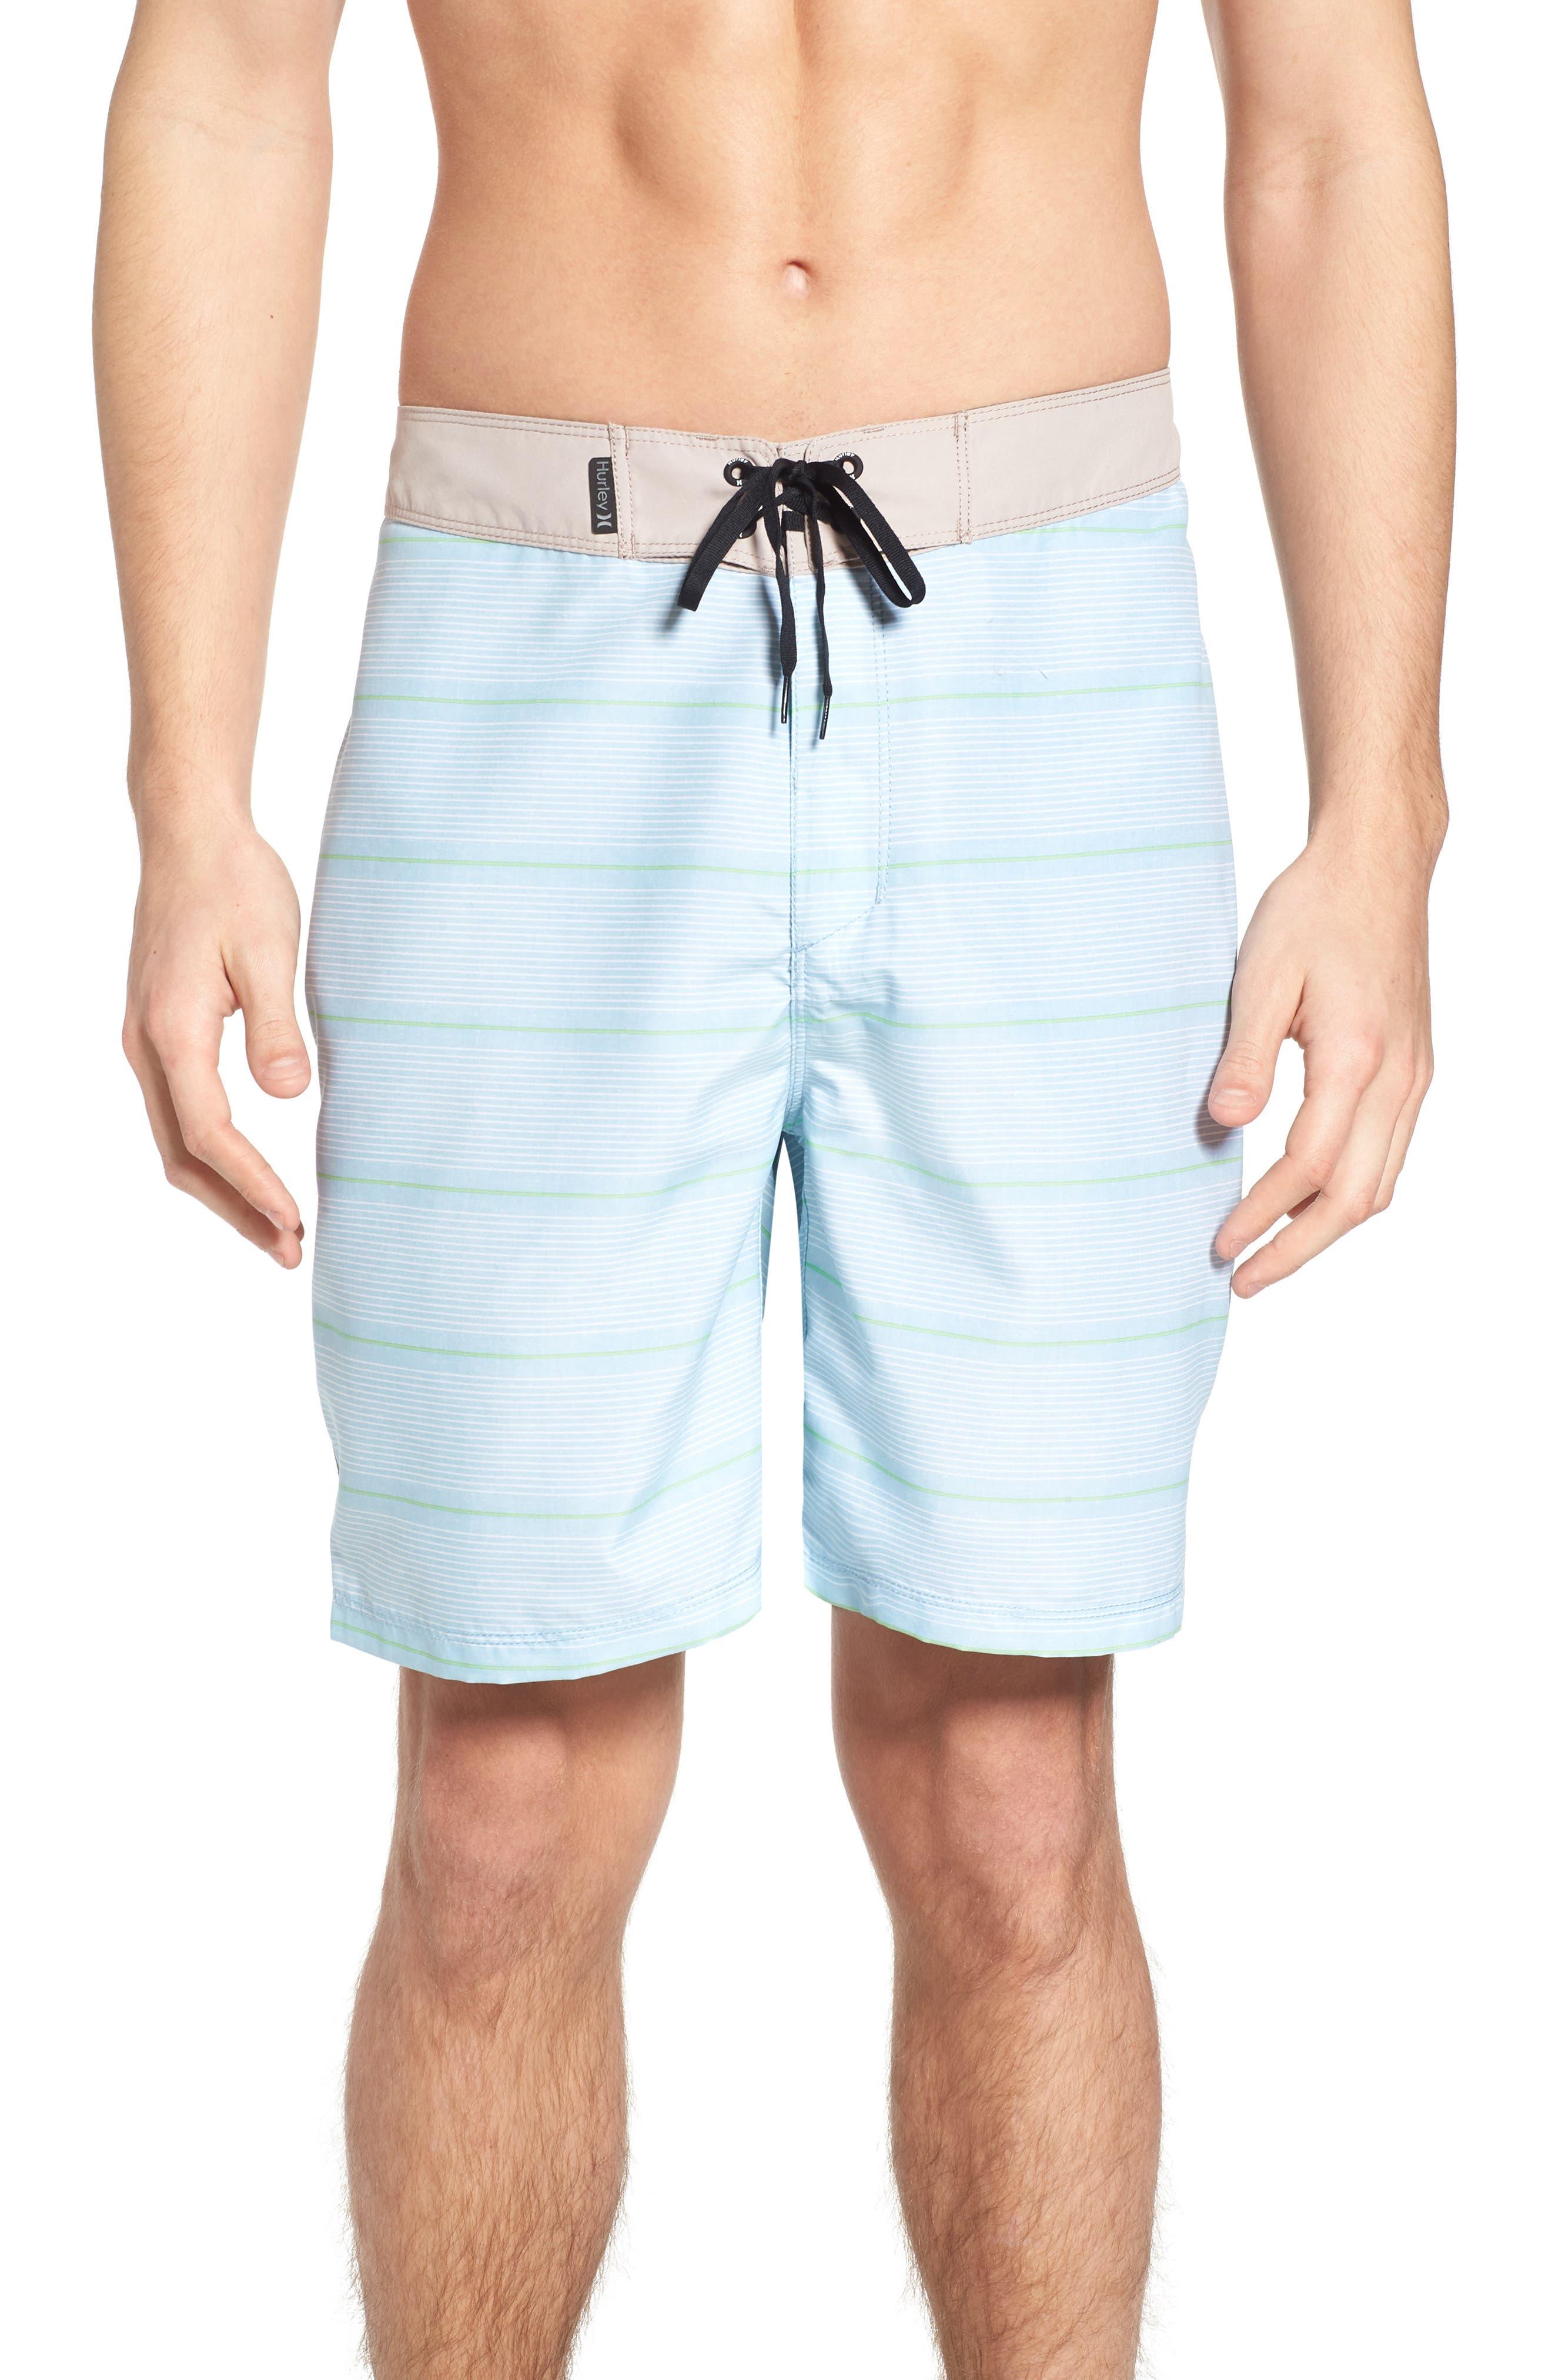 Shoreside Board Shorts,                         Main,                         color, Ocean Bliss